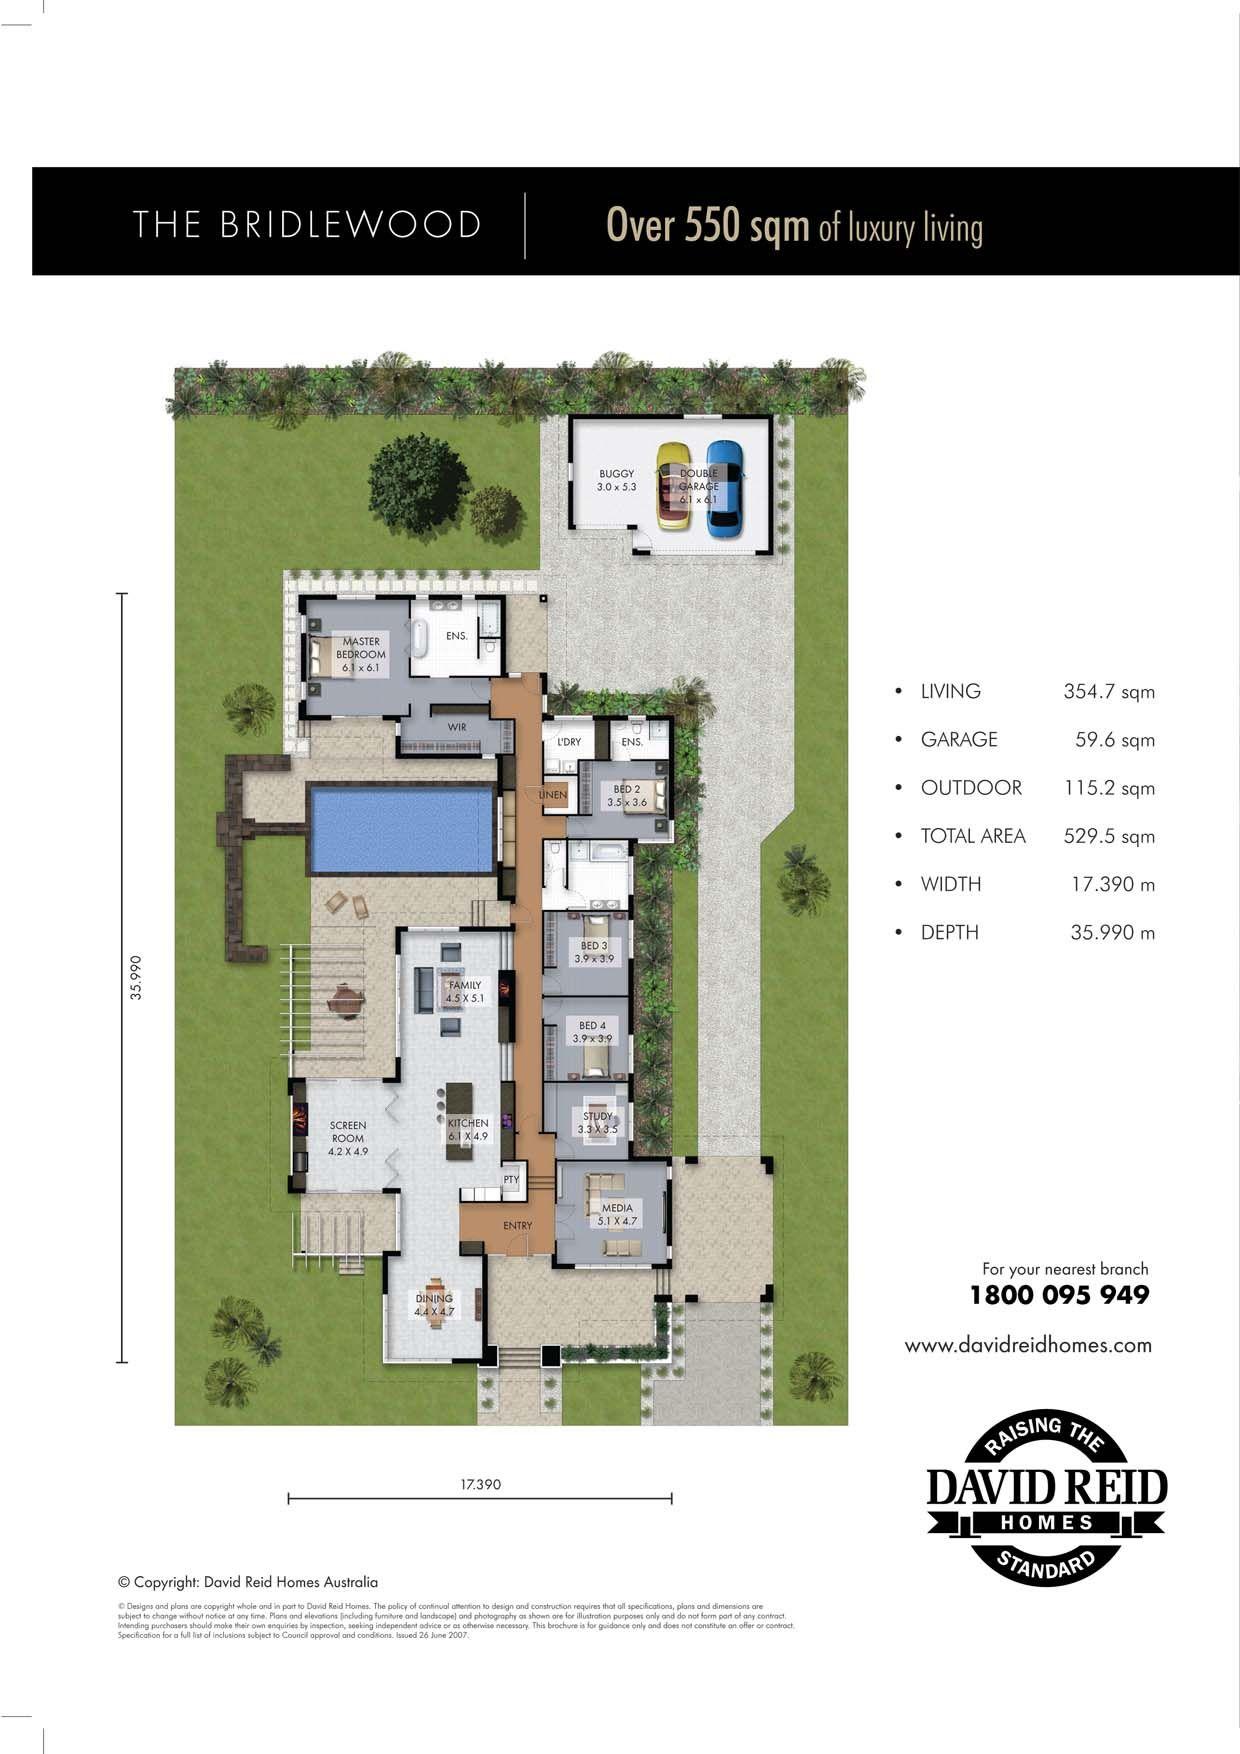 The Bridlewood Floor Plan   Concept Range. David Reid Homes Australia, Luxury  Custom Home